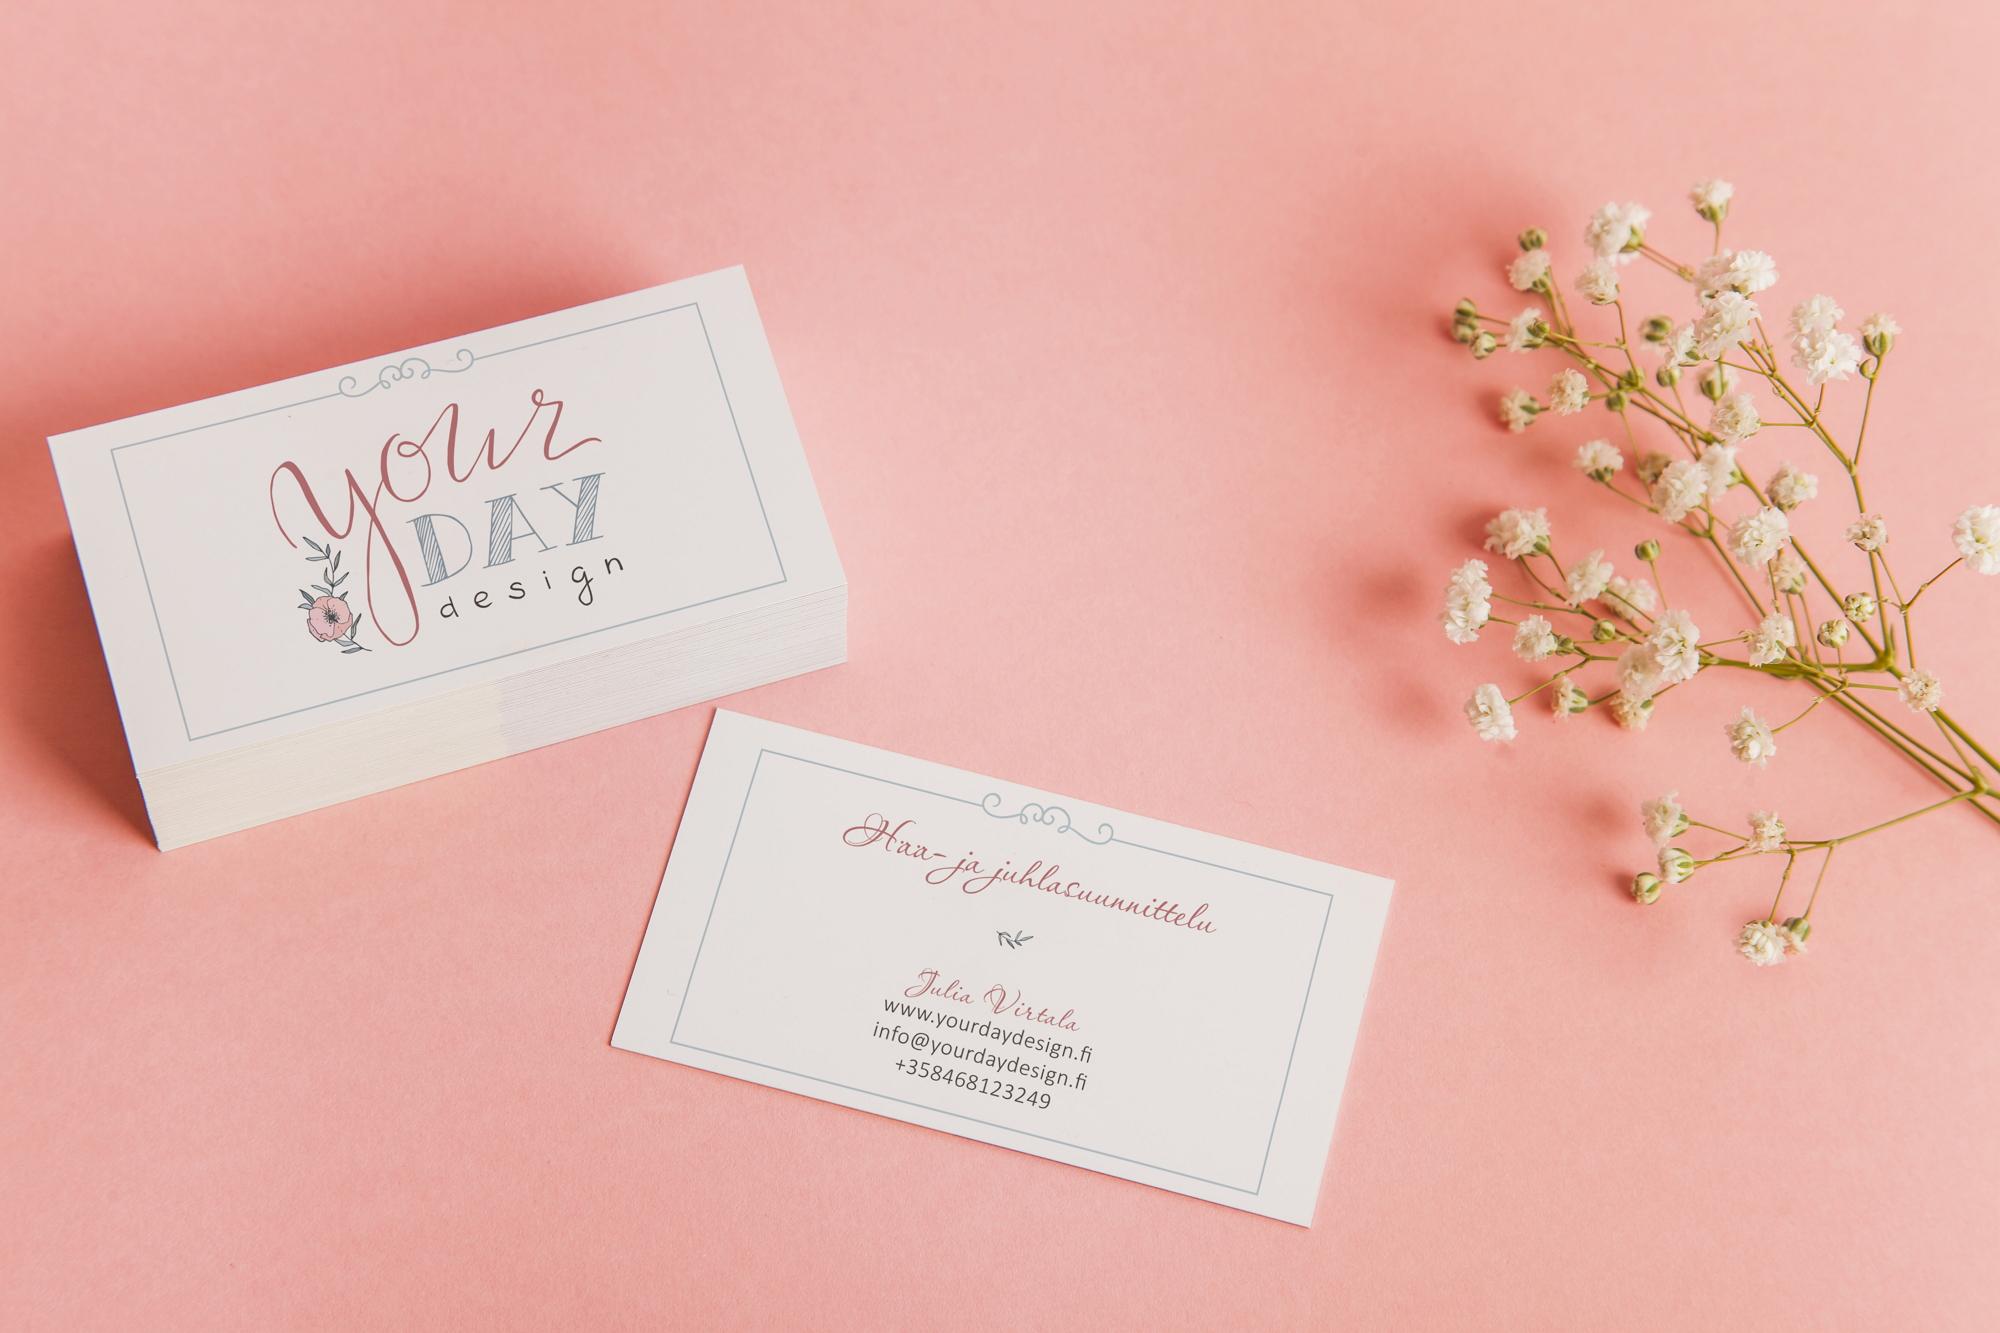 wedding styling company logos item